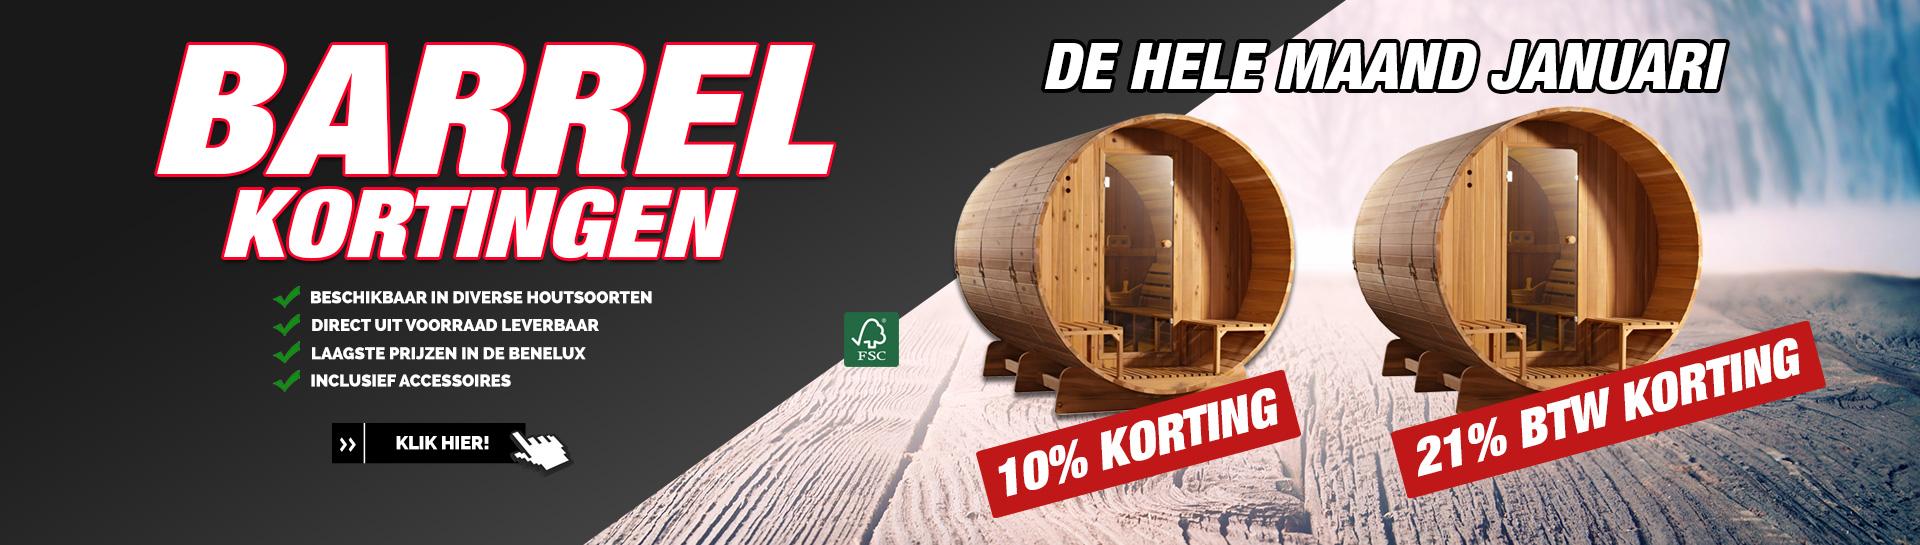 Barrel sauna januari actie